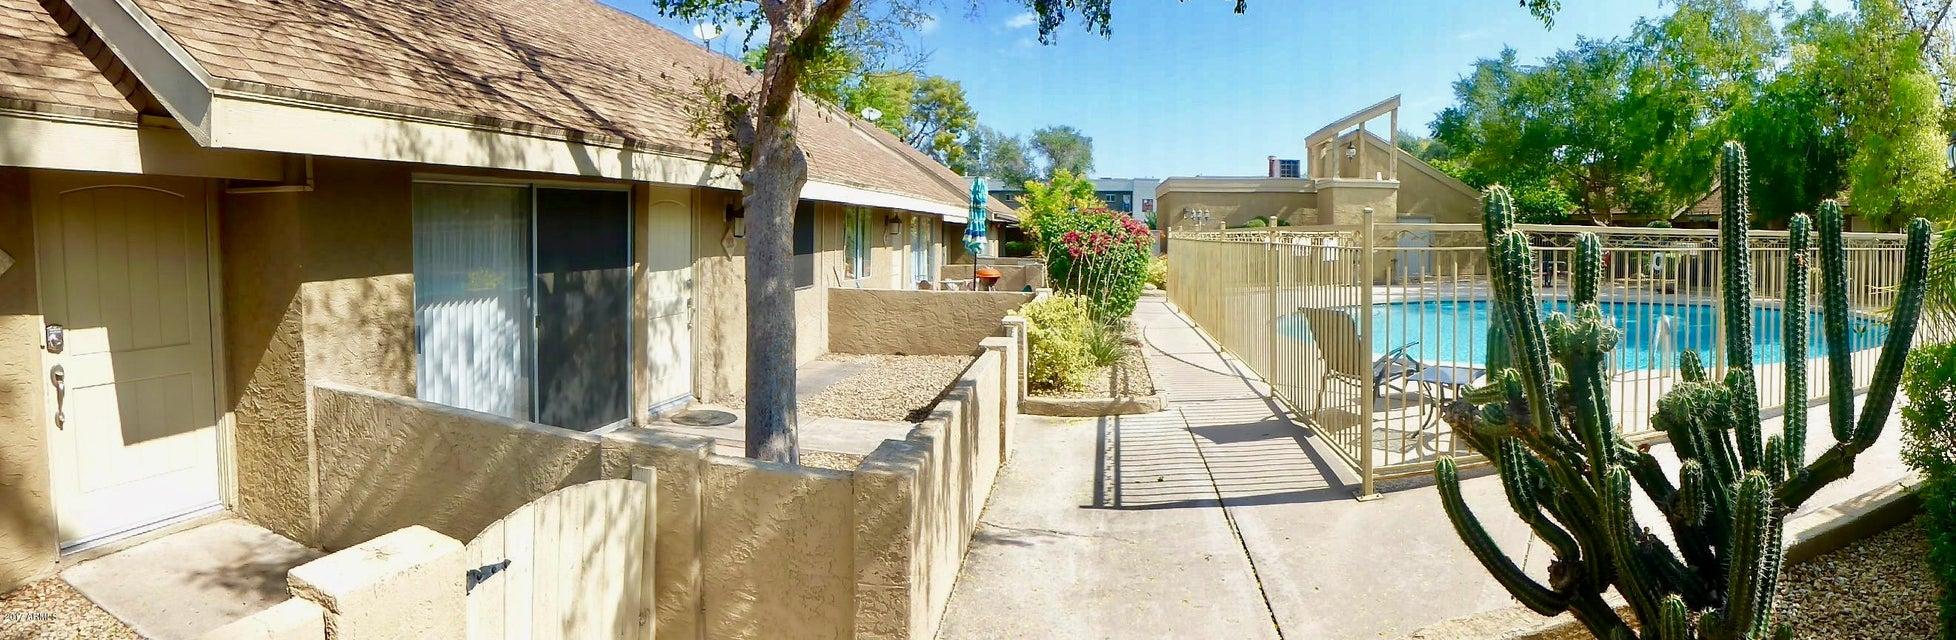 3807 N 30TH Street 23, Phoenix, AZ 85016